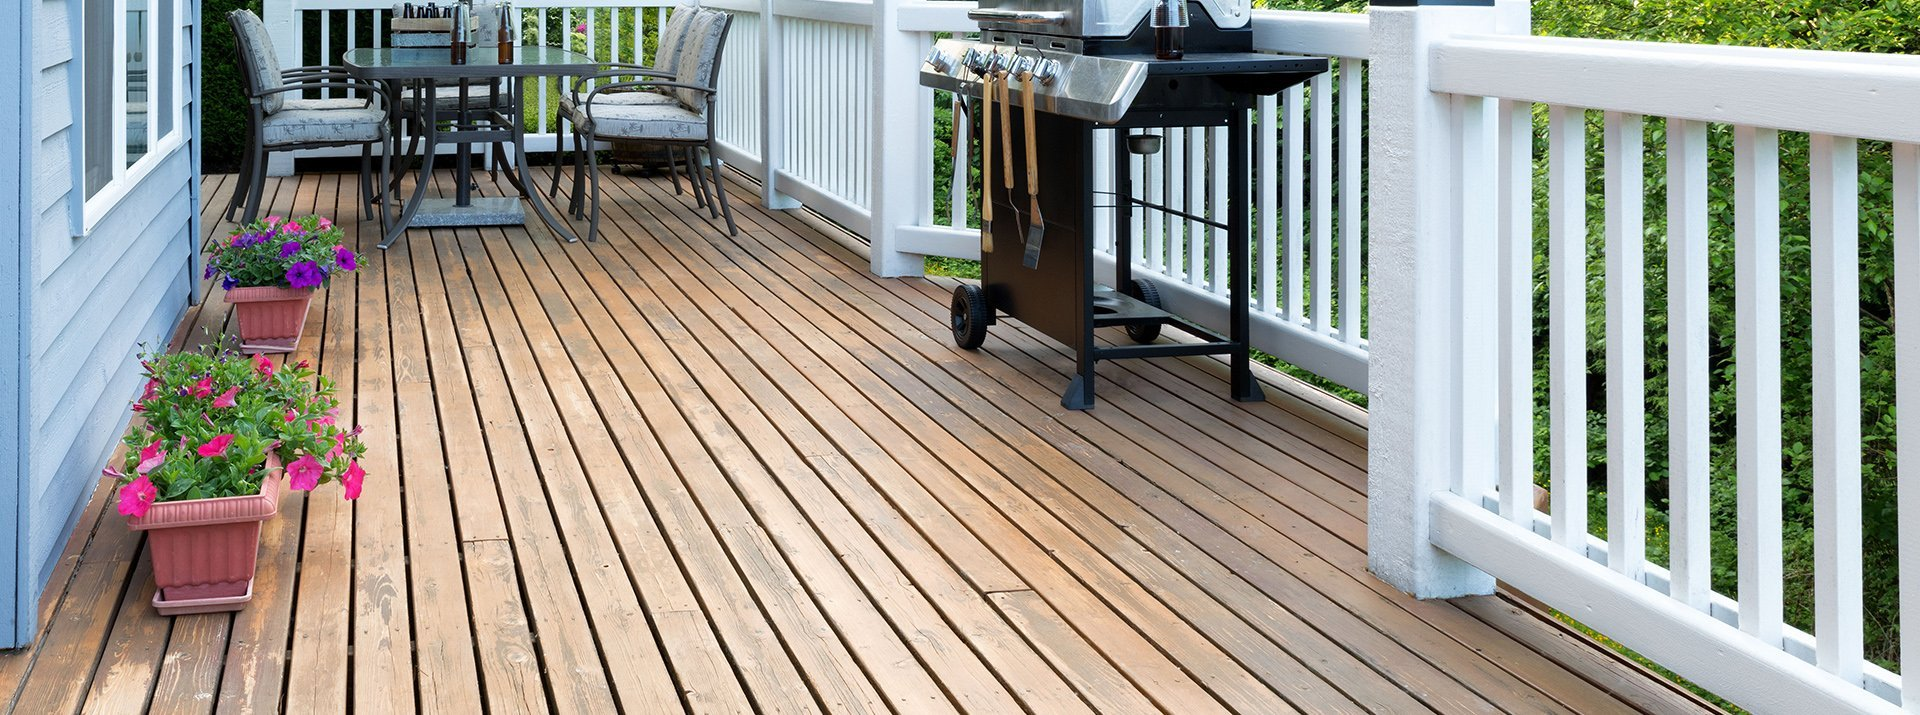 Cedar wood decks